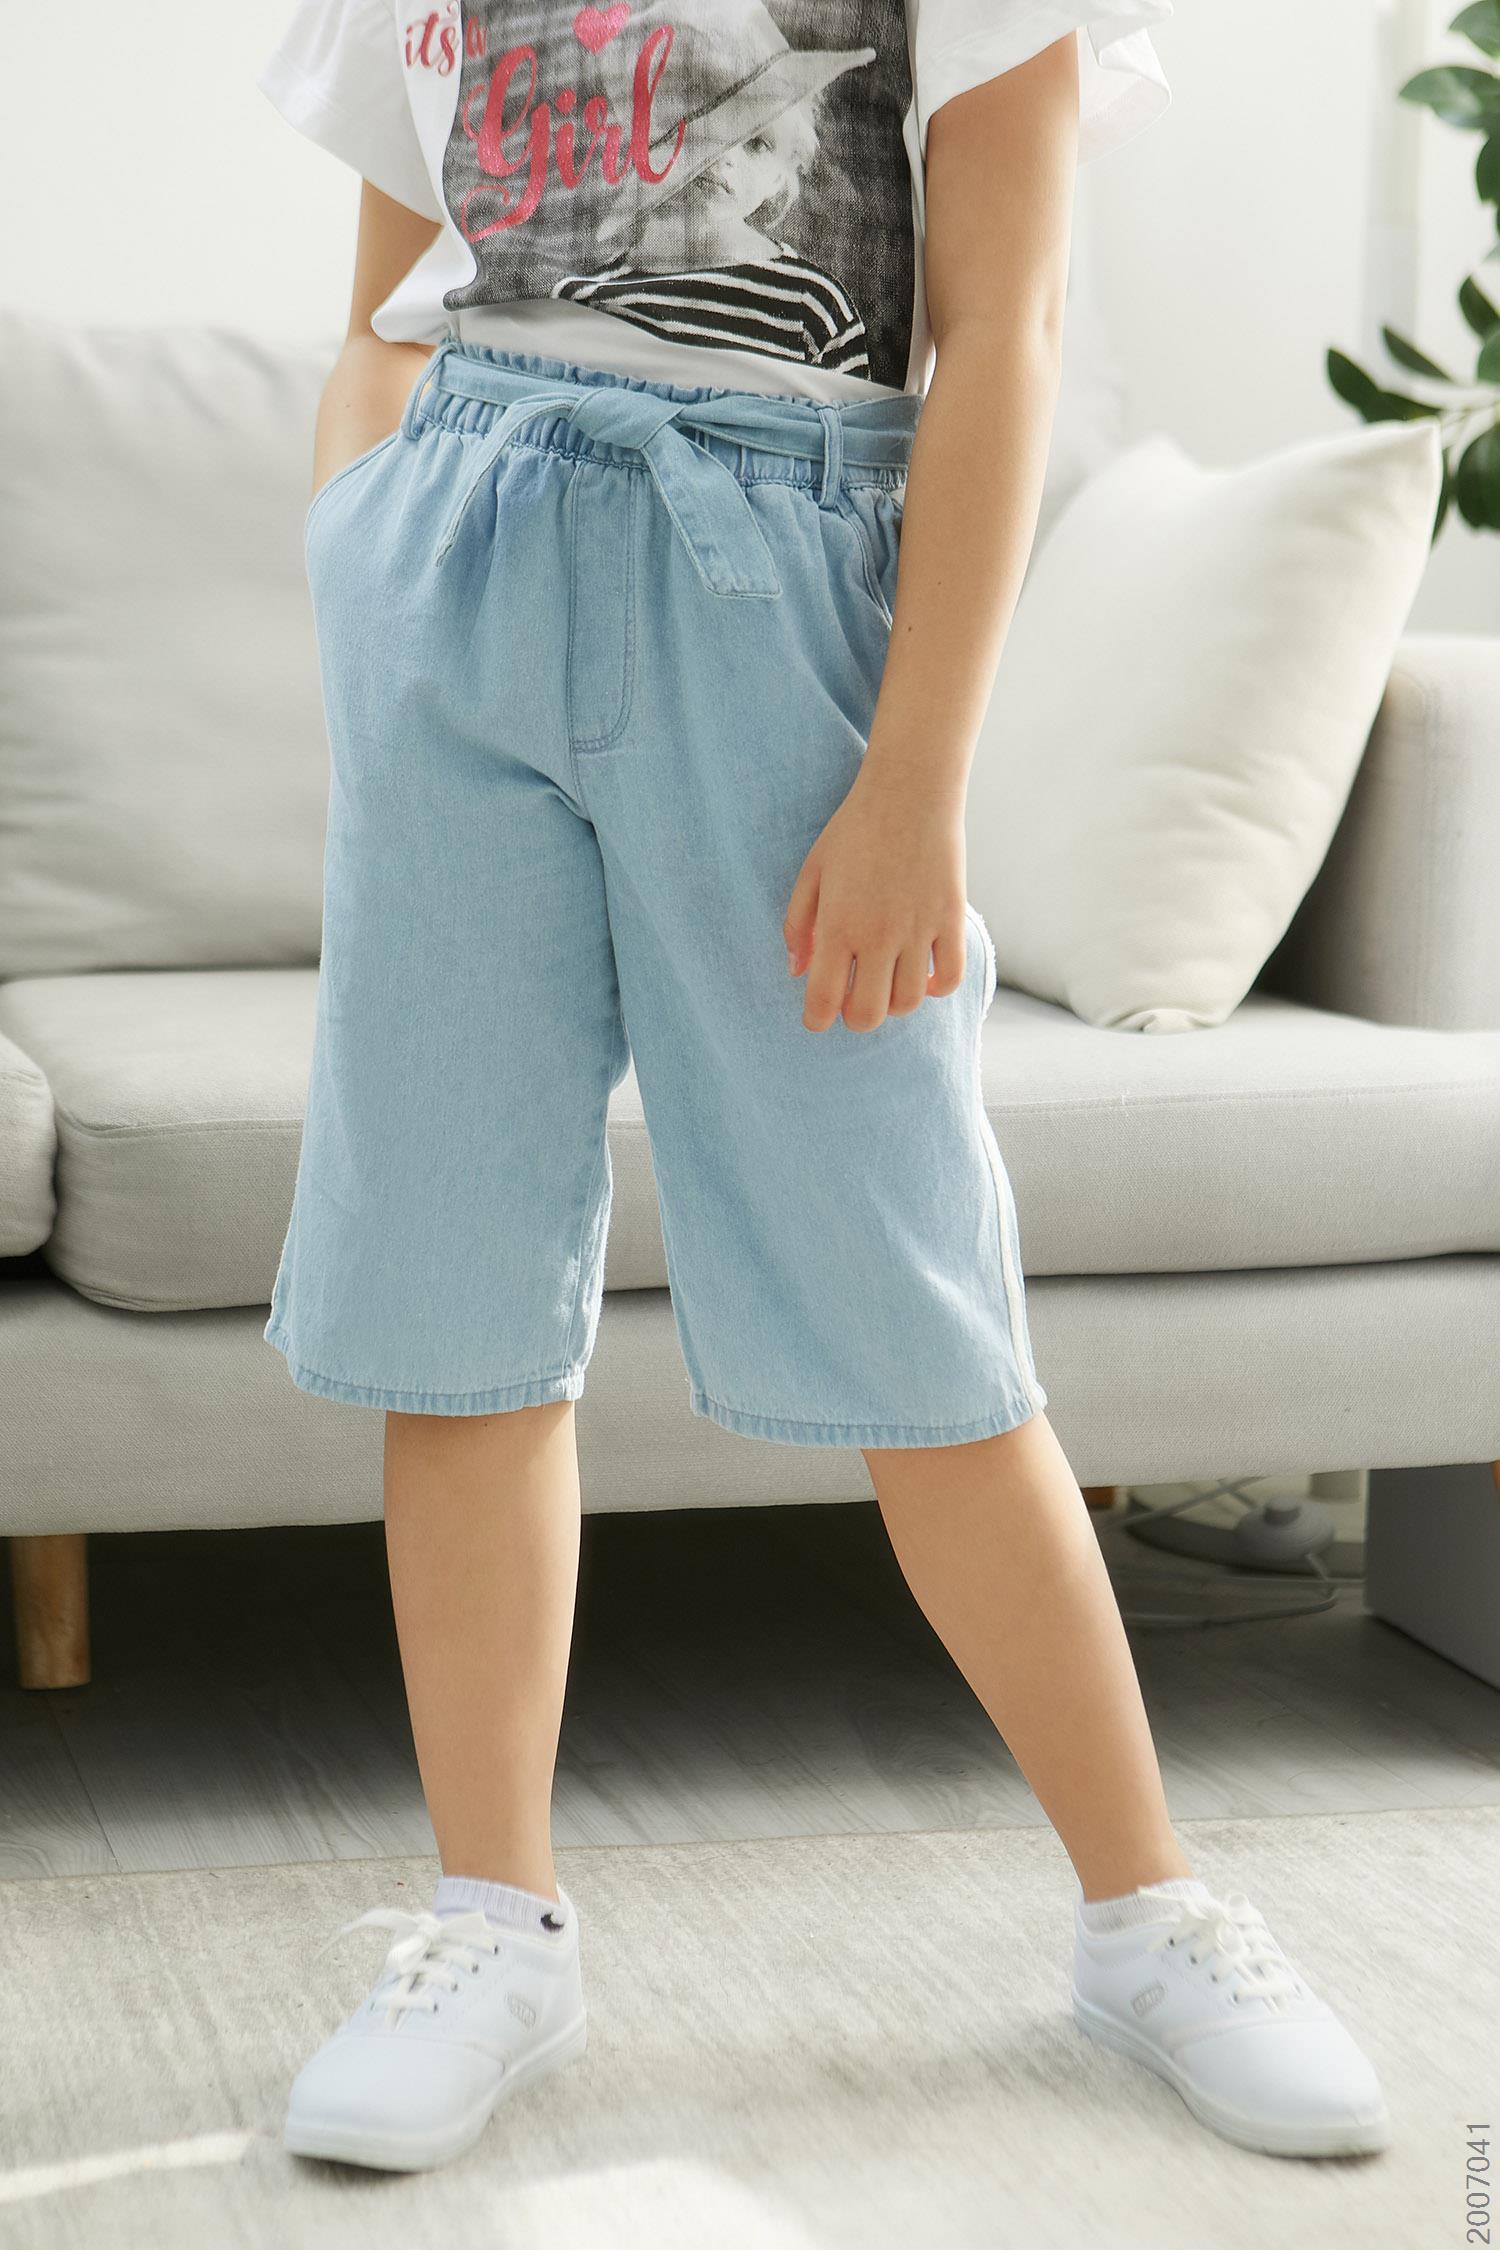 quần jean bé gái - 2007041